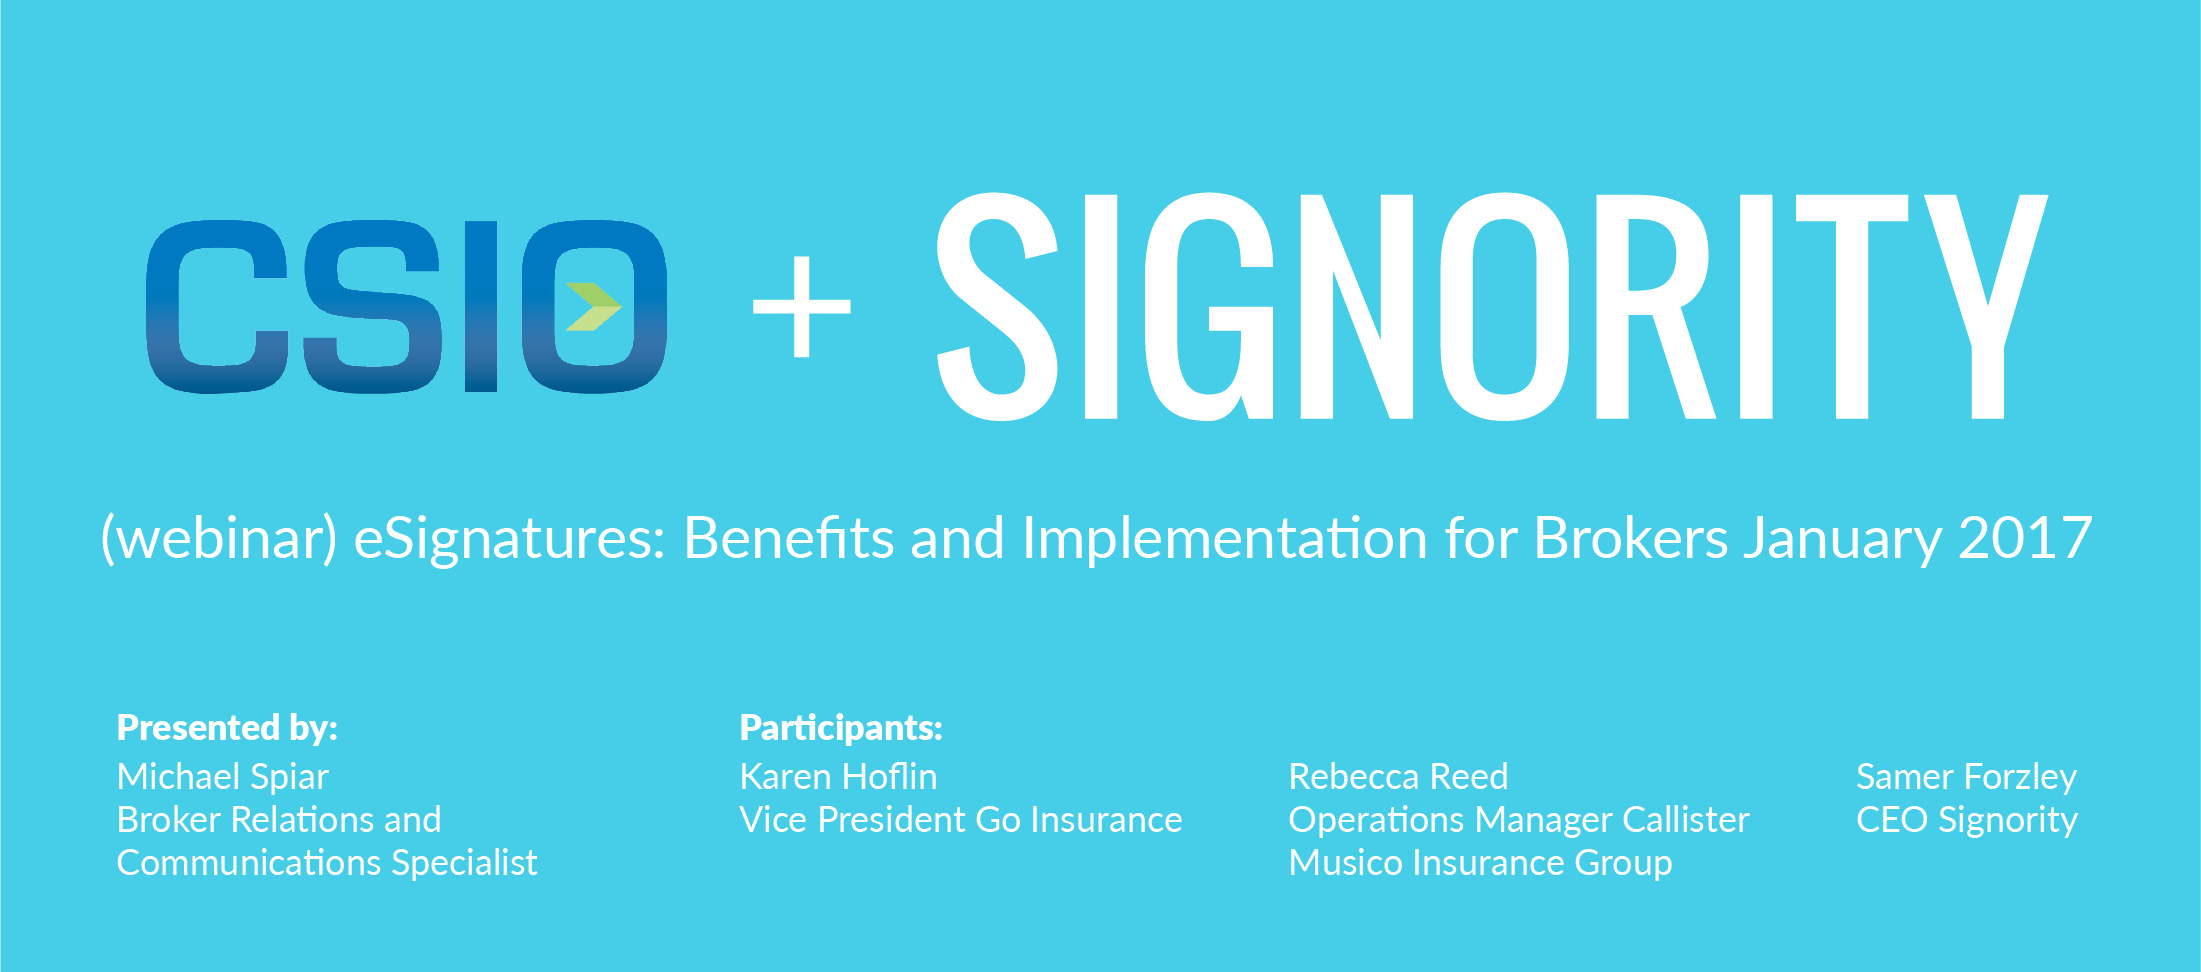 CSIO eSignature Webinar for Insurance Brokers